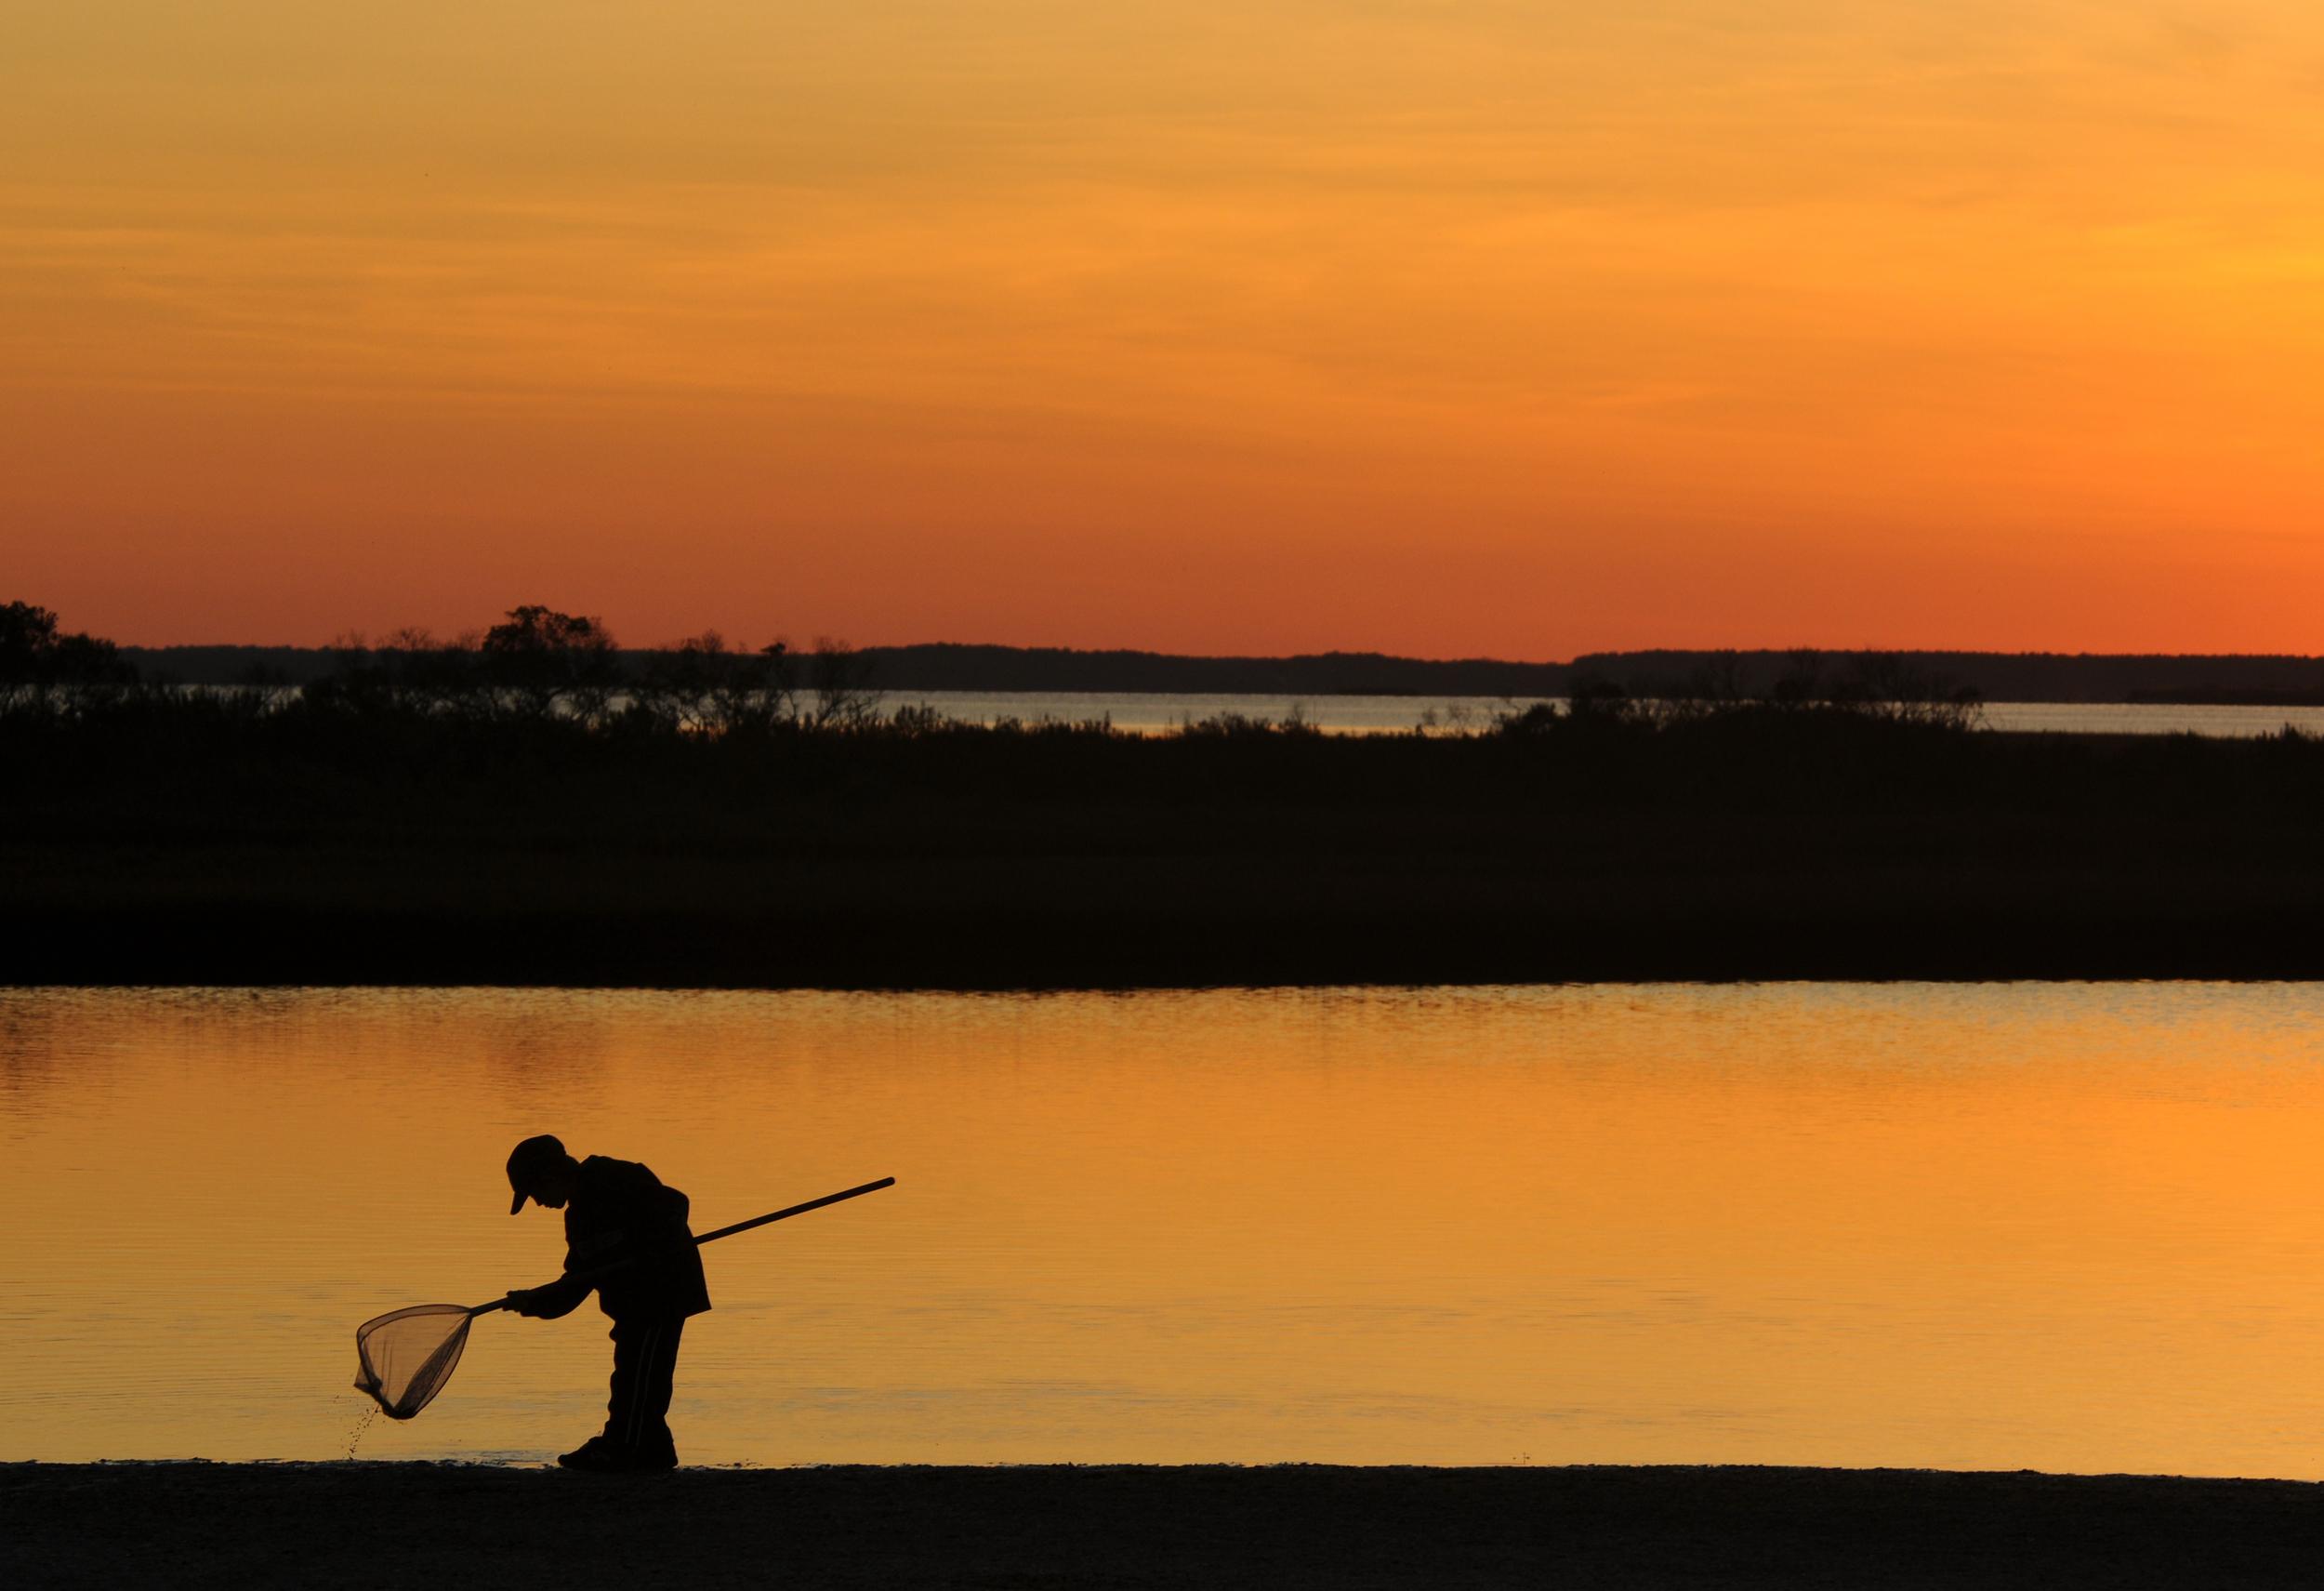 On Delmarva: Child crabbing at sunset